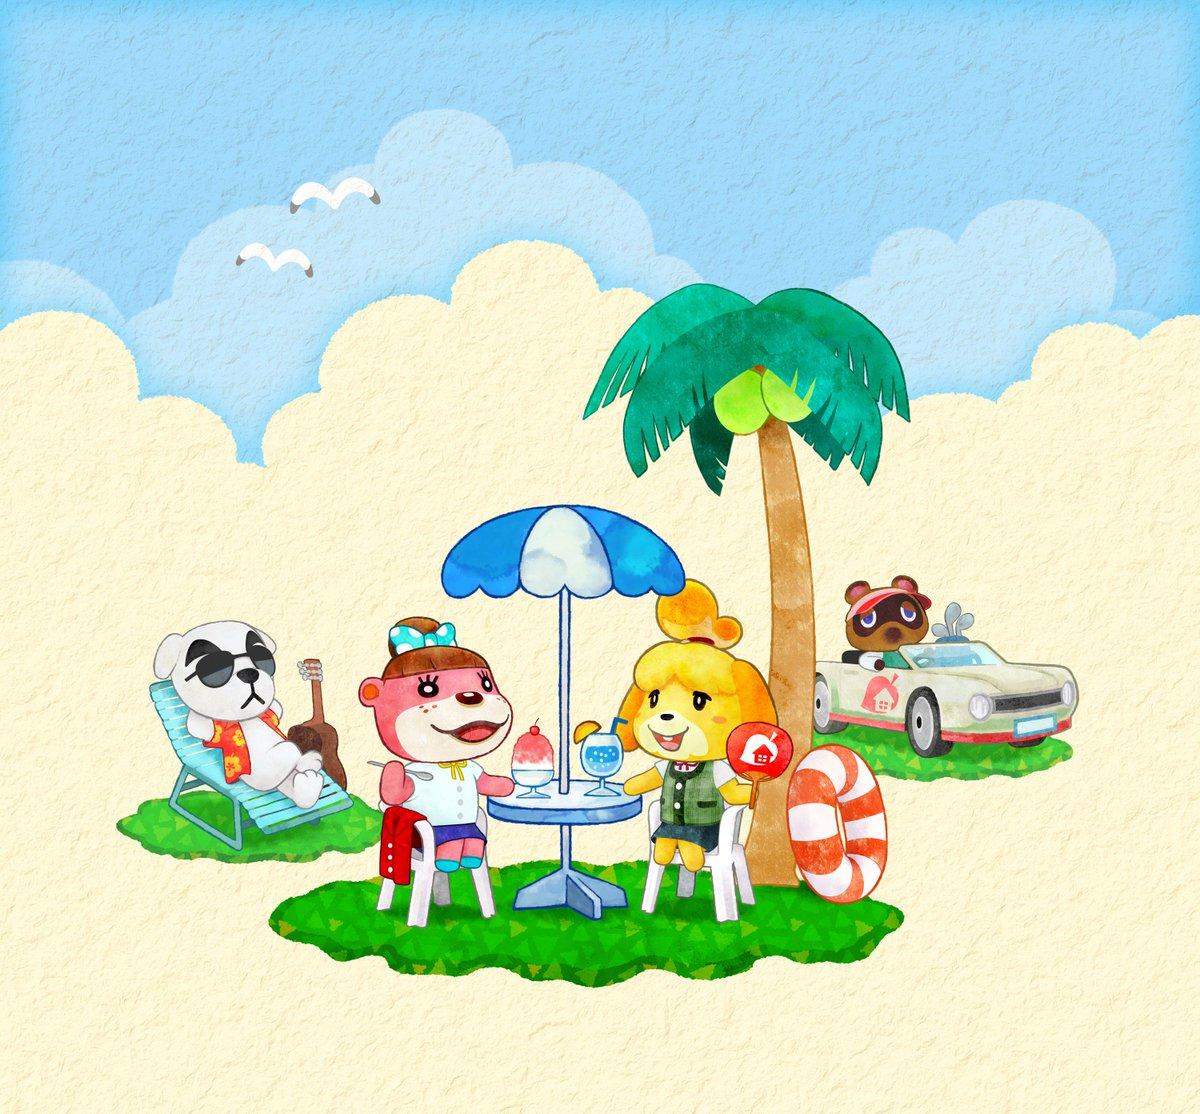 Animal Crossing Uk On Twitter Summery Greetings From Animal